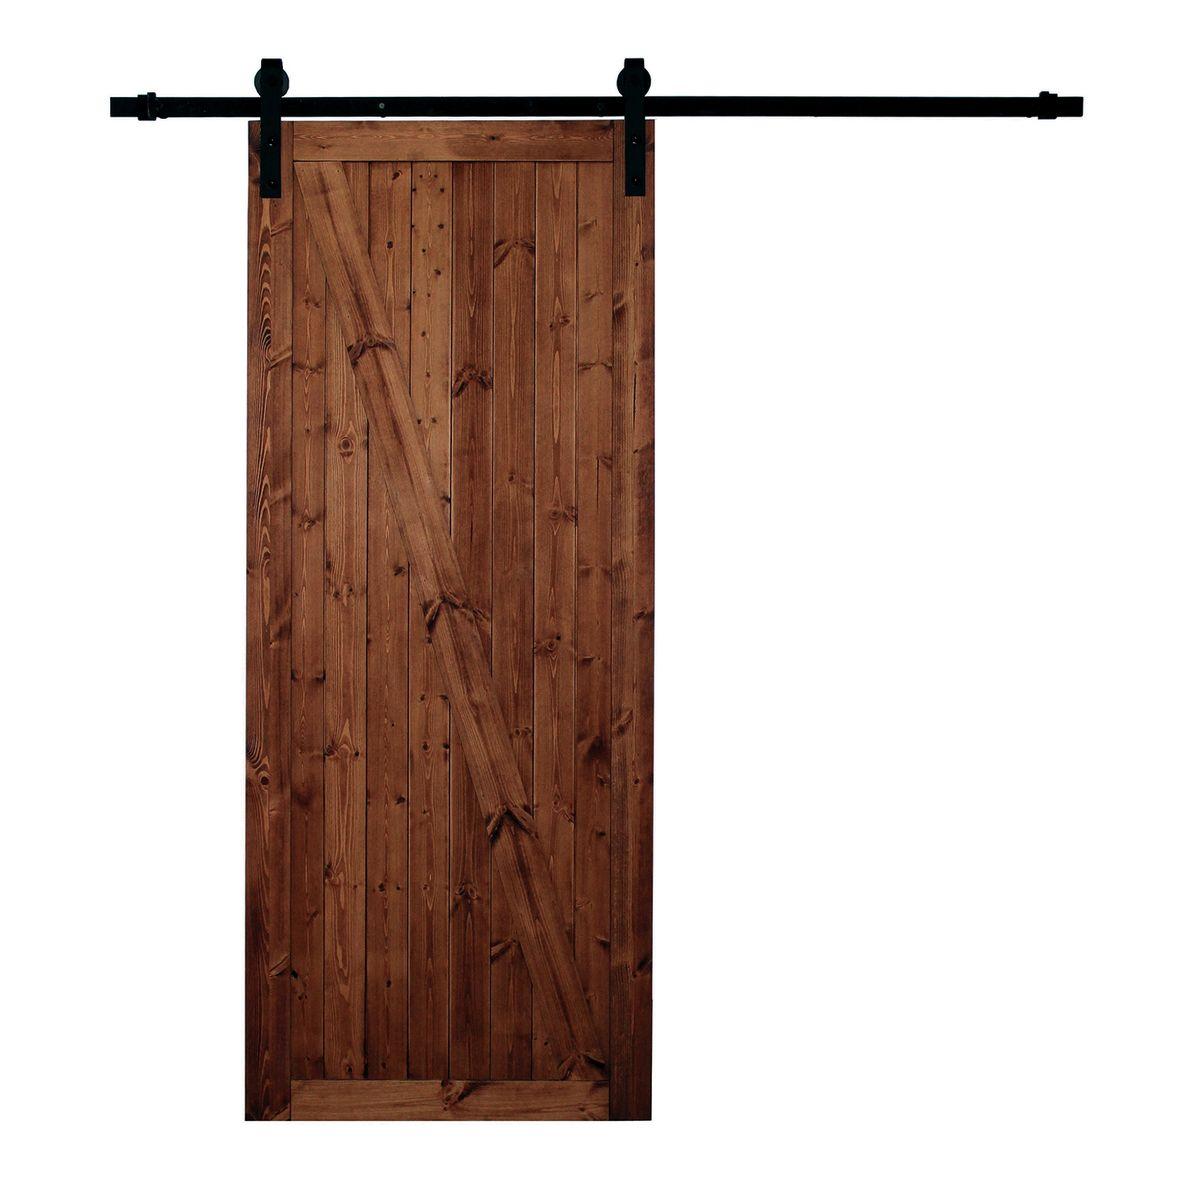 Porte scorrevoli in legno e vetro zp12 regardsdefemmes - Spazzole per porte scorrevoli ...